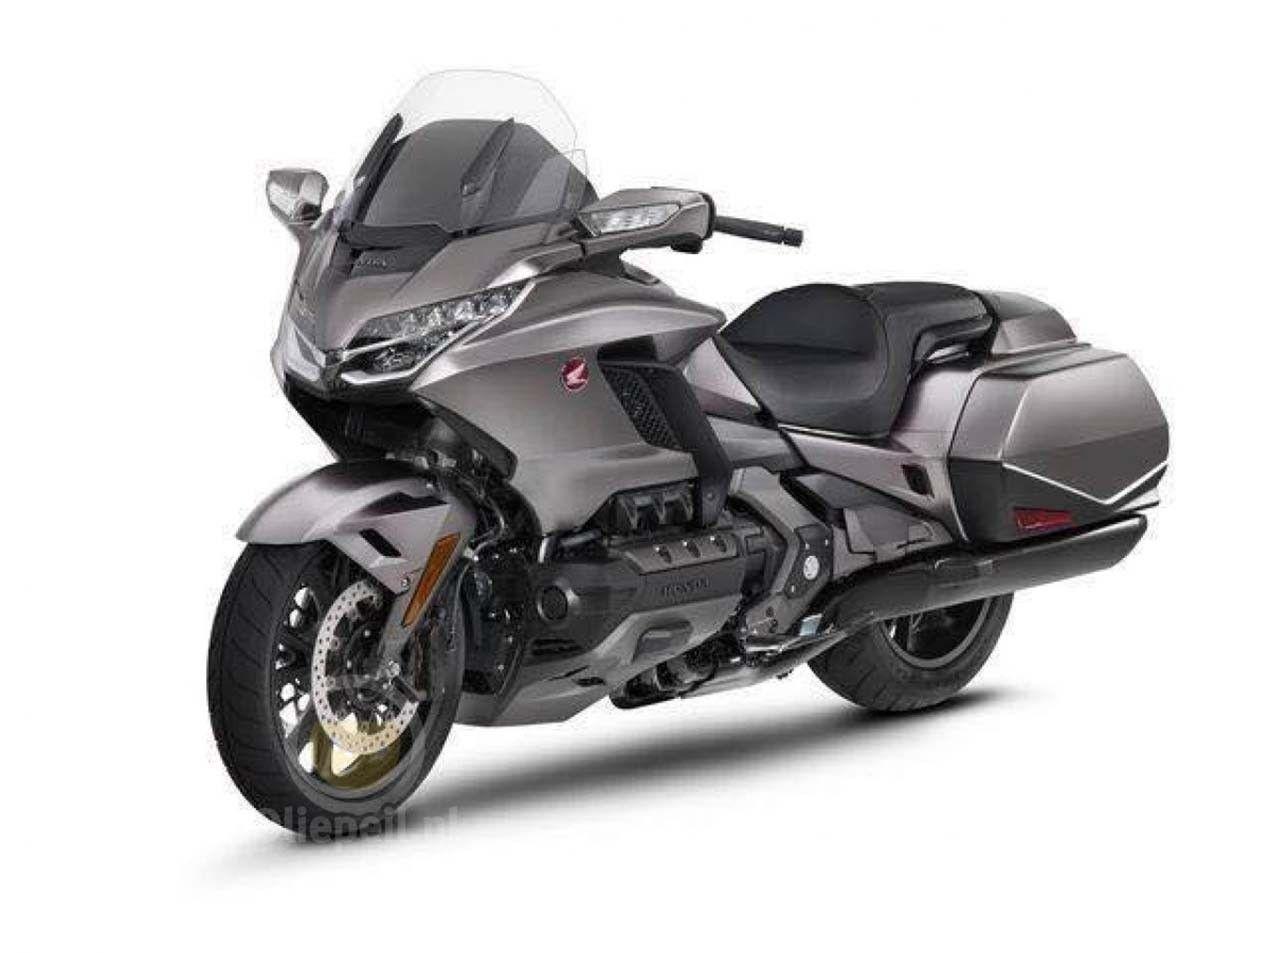 New 2019 Honda Goldwing 1800 Price Honda motorcycles